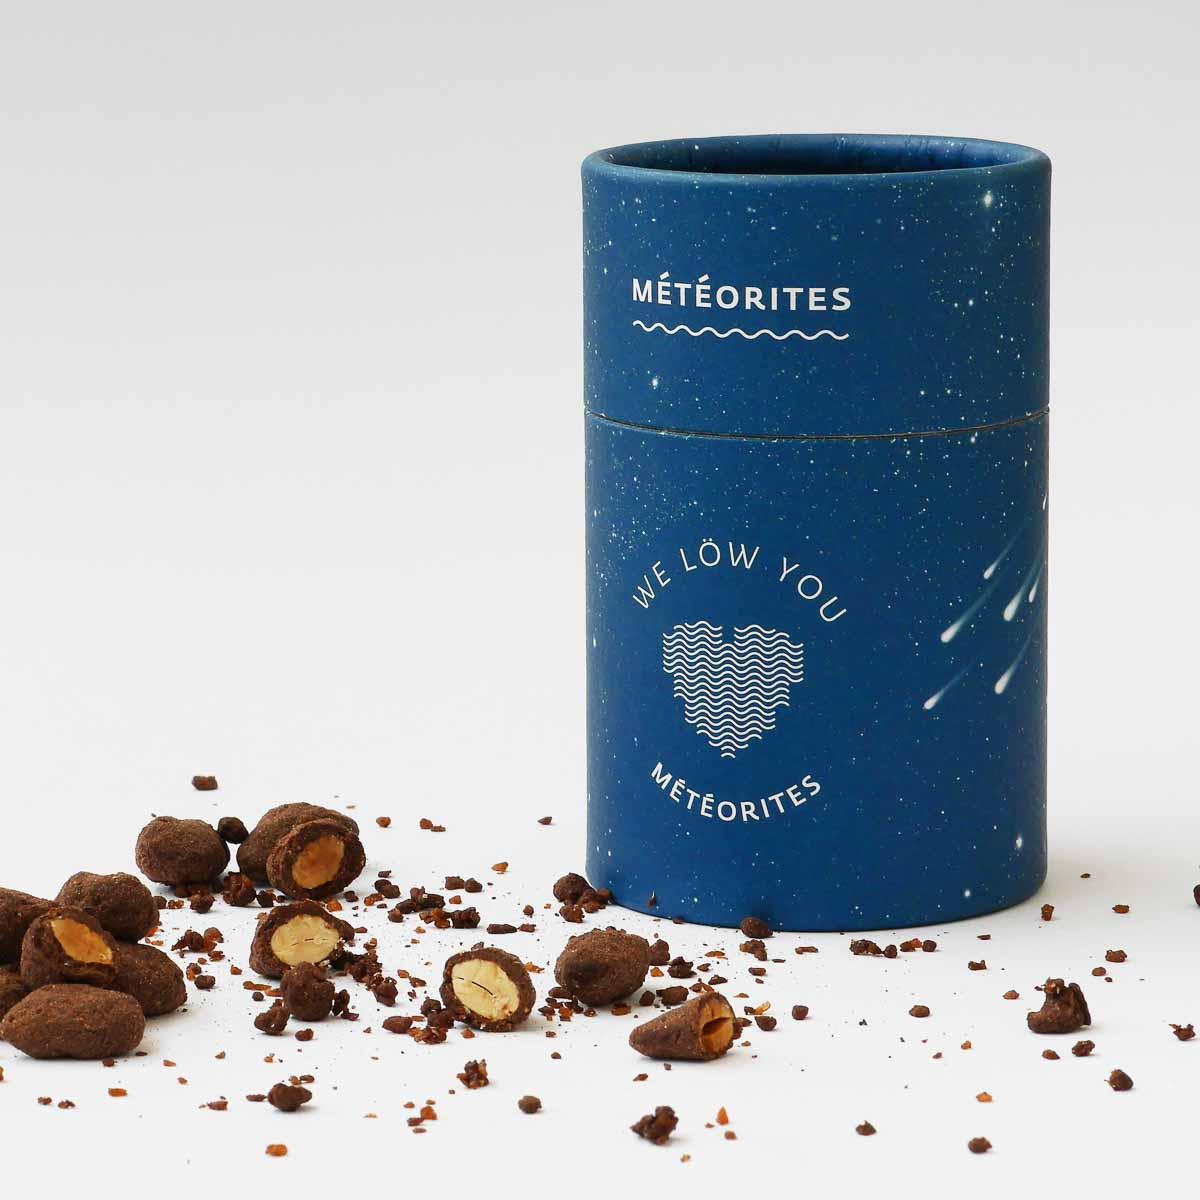 Löw Delights Gourmet Schokolade aus Zürich-5